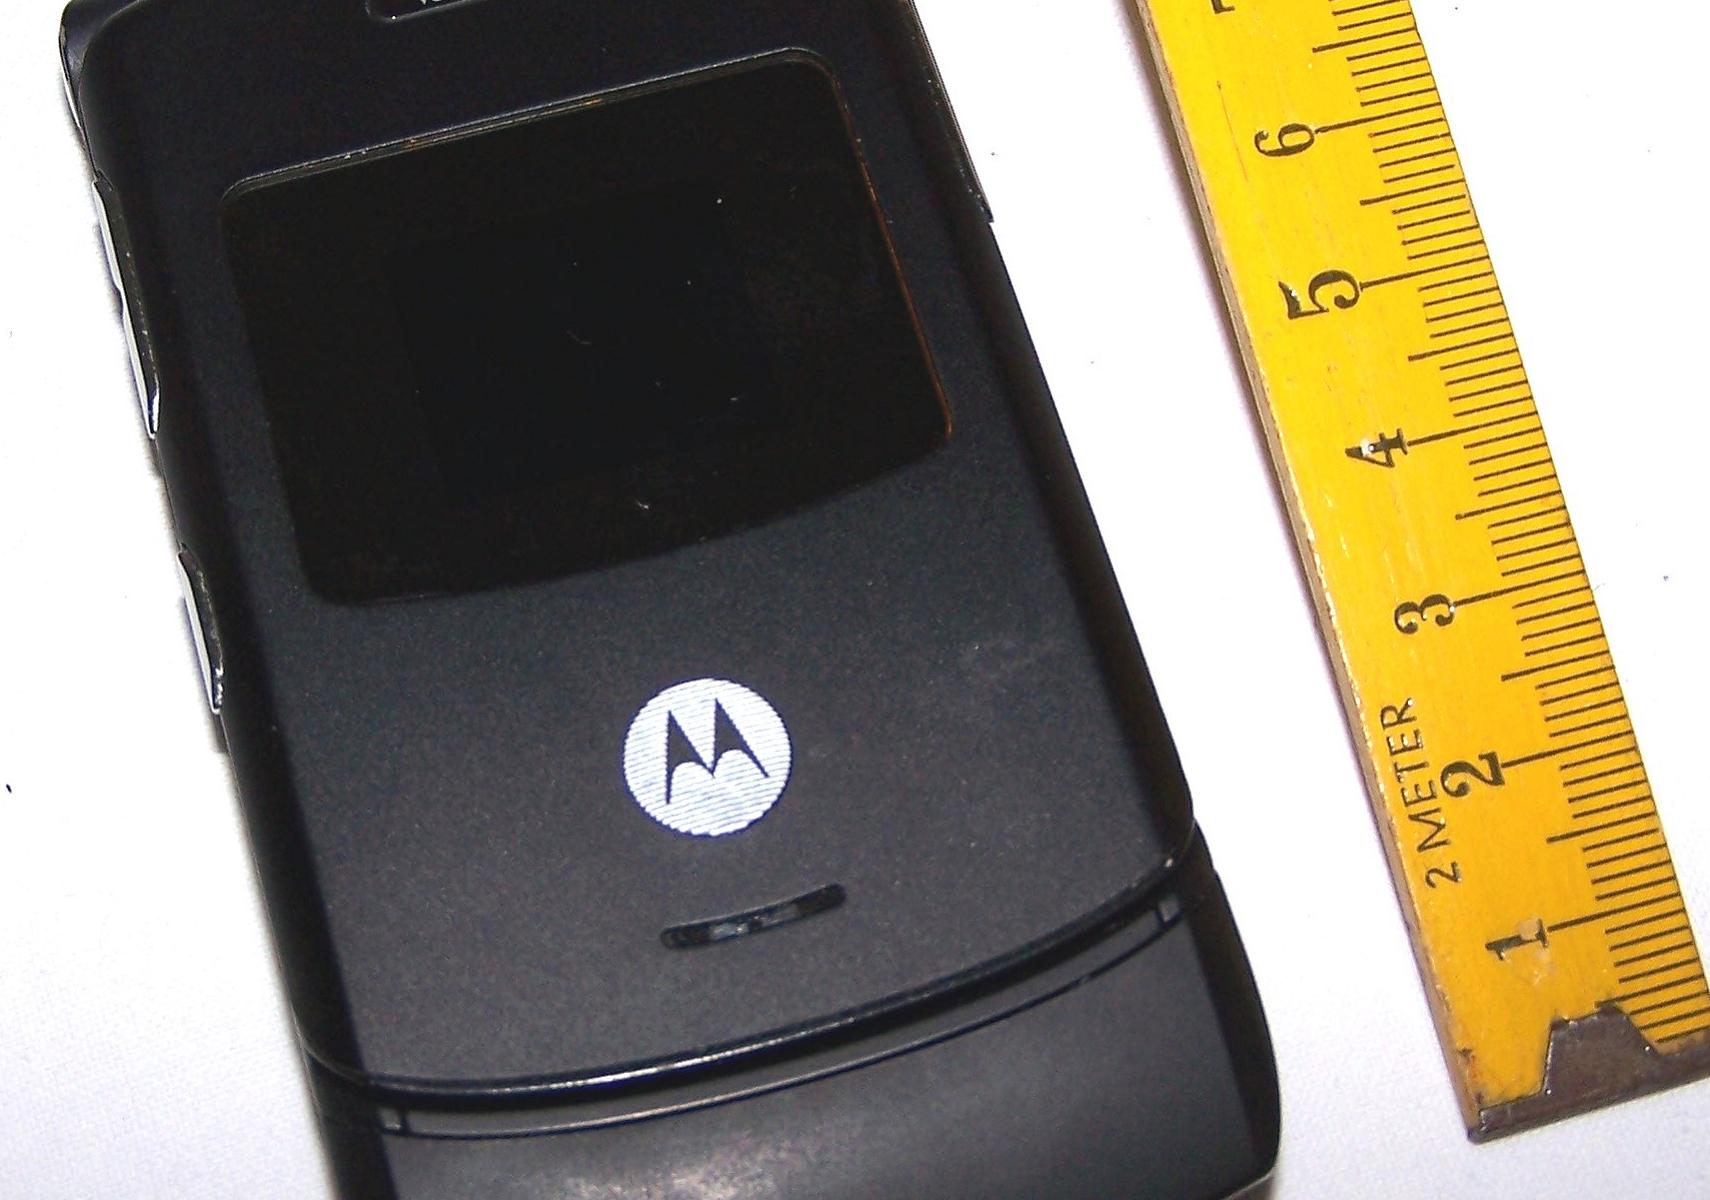 Büro - IT & Kommunikation - Mobiltelefon Motorola Motorazr V3